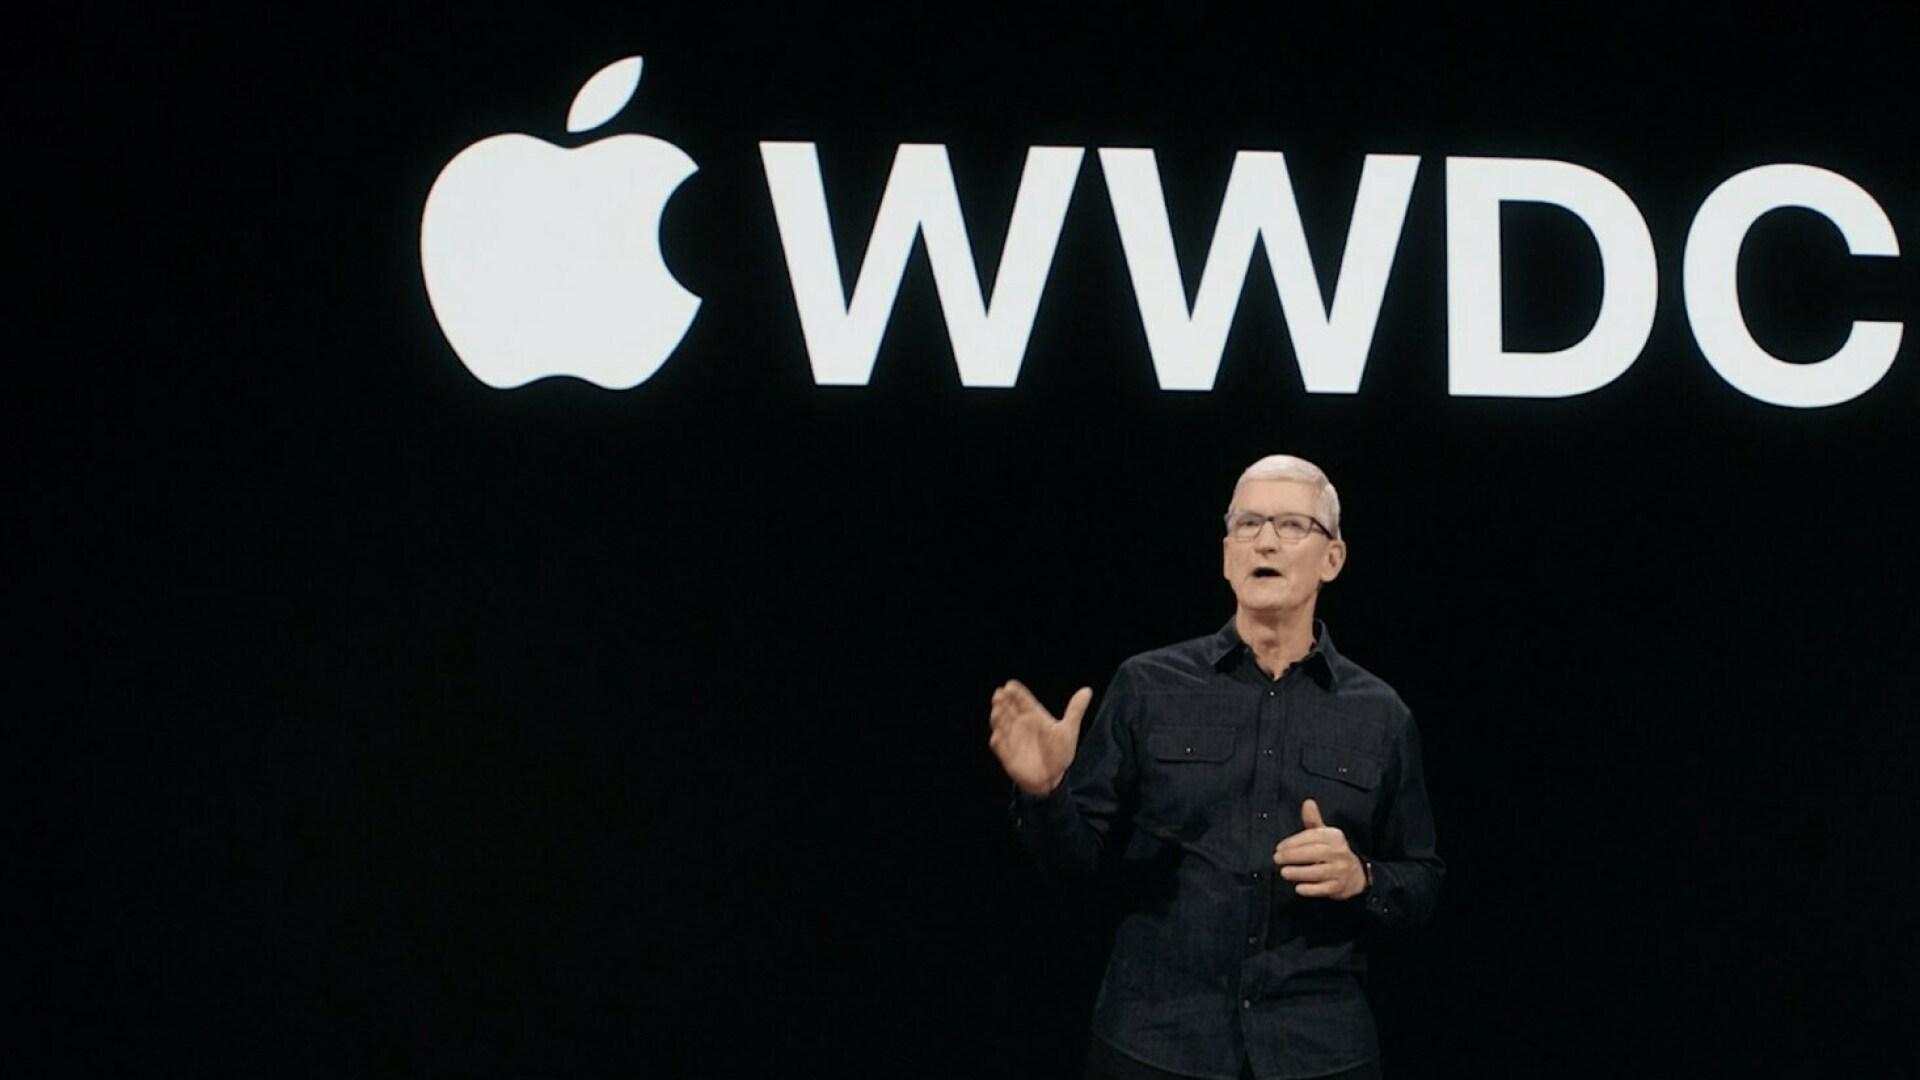 Apple, Keynote, Tim Cook, Wwdc, WWDC 2021, Worldwide Developers Conference, WWDC21